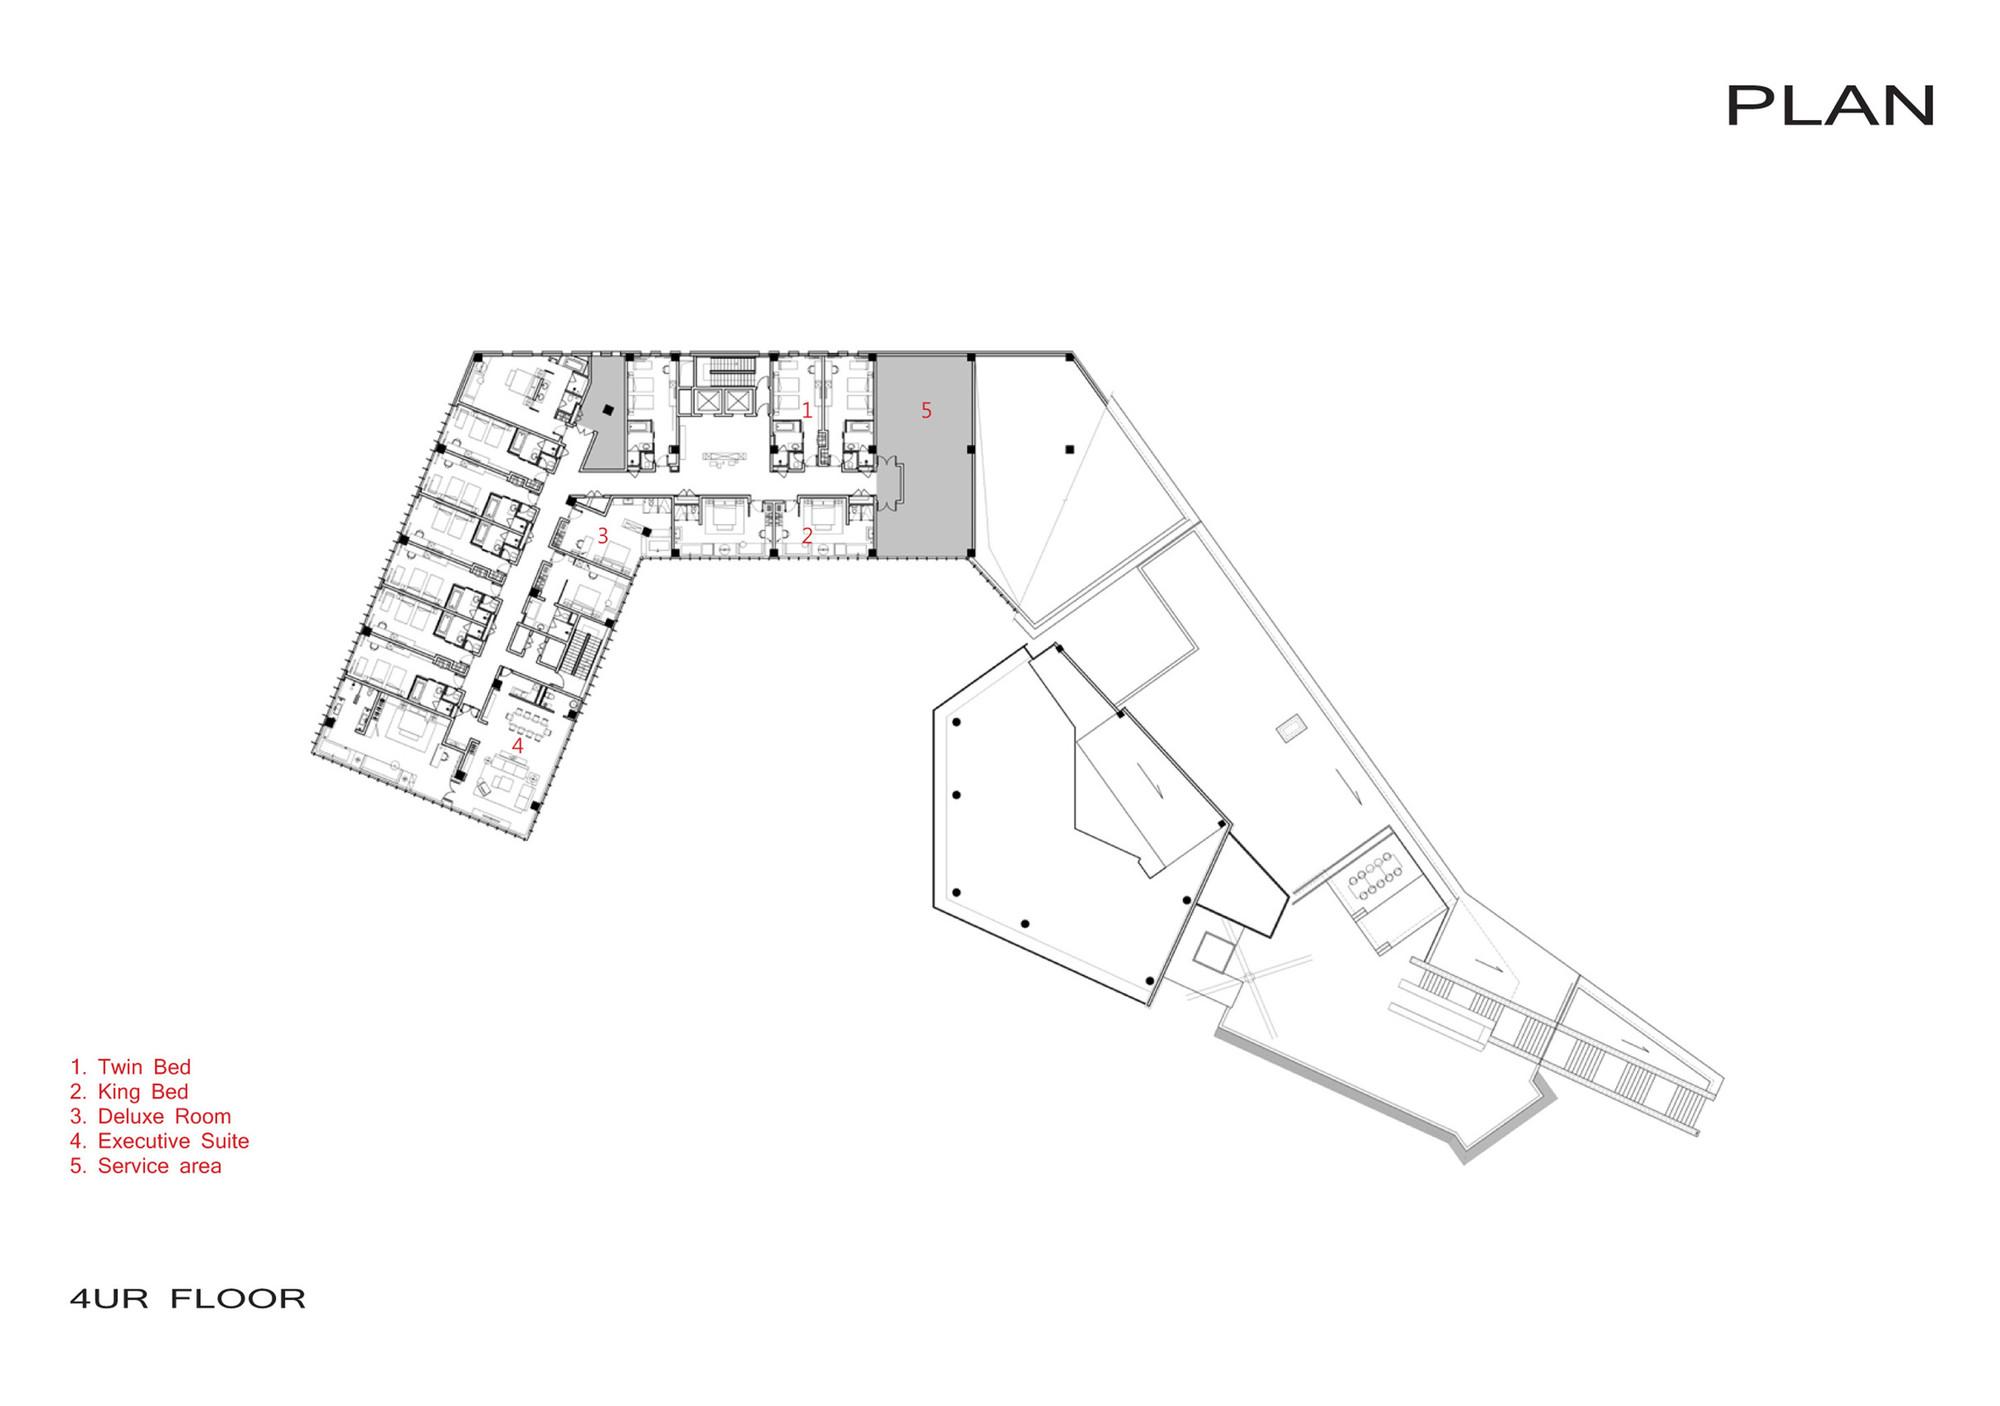 Architectural Design Brief For A Hotel